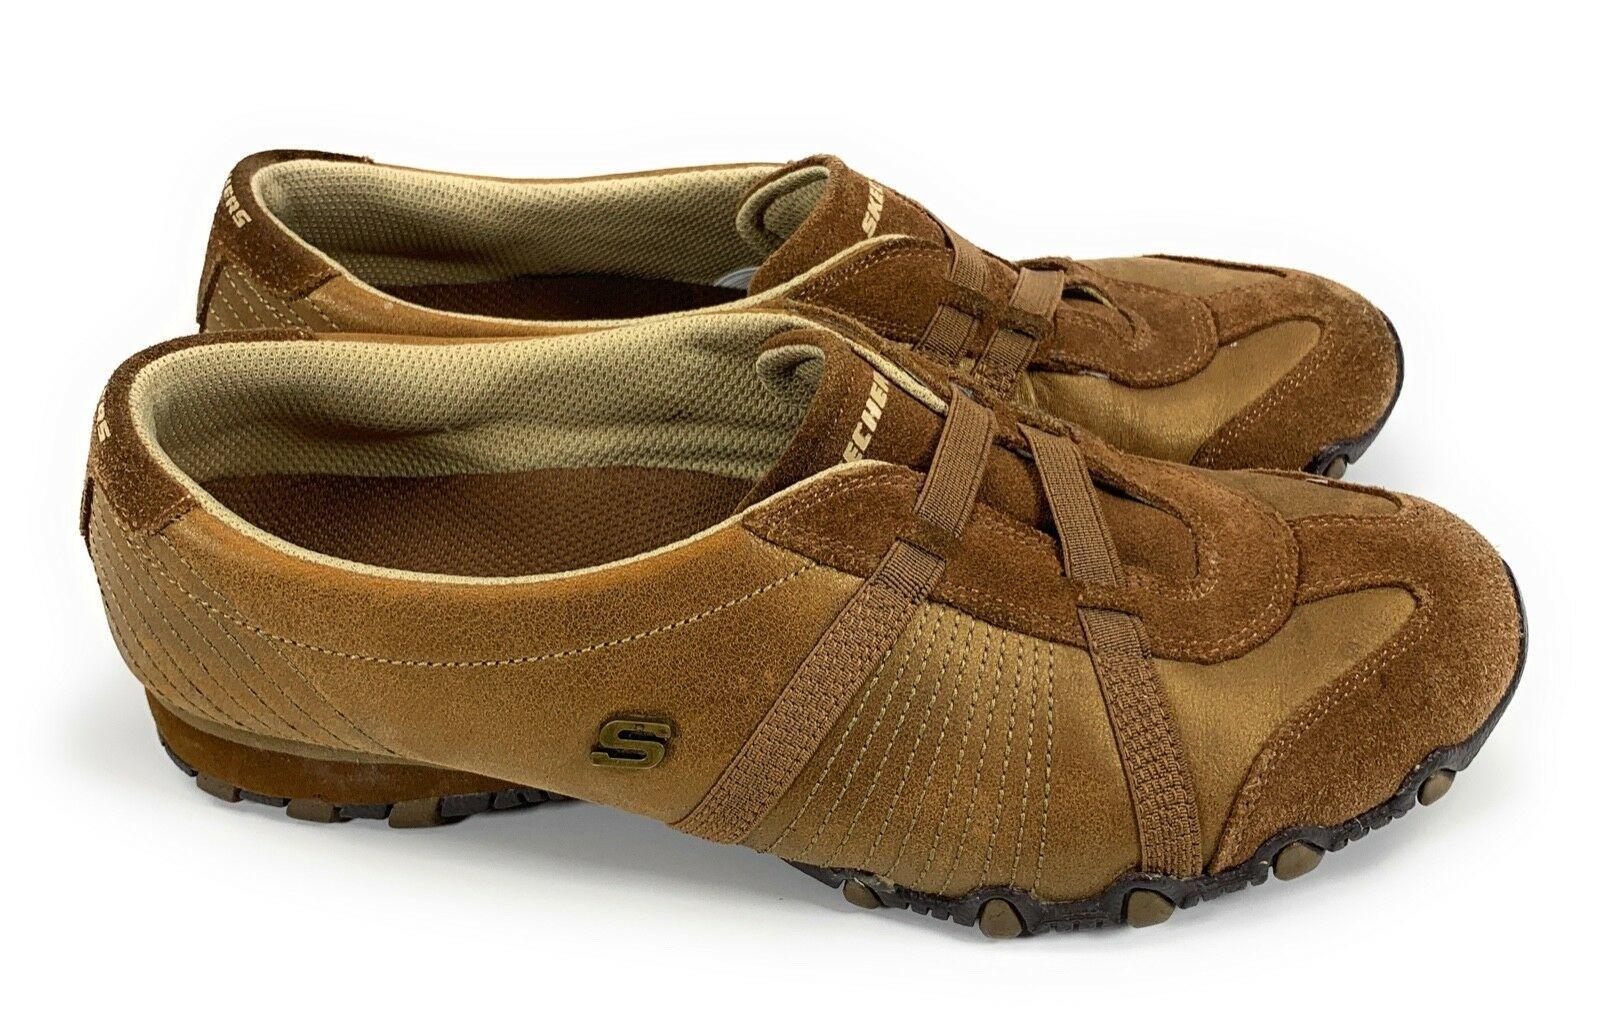 Skechers 46577 Bronze Brown Leather Elastic Strap Biker Sneakers Shoes Women's 9